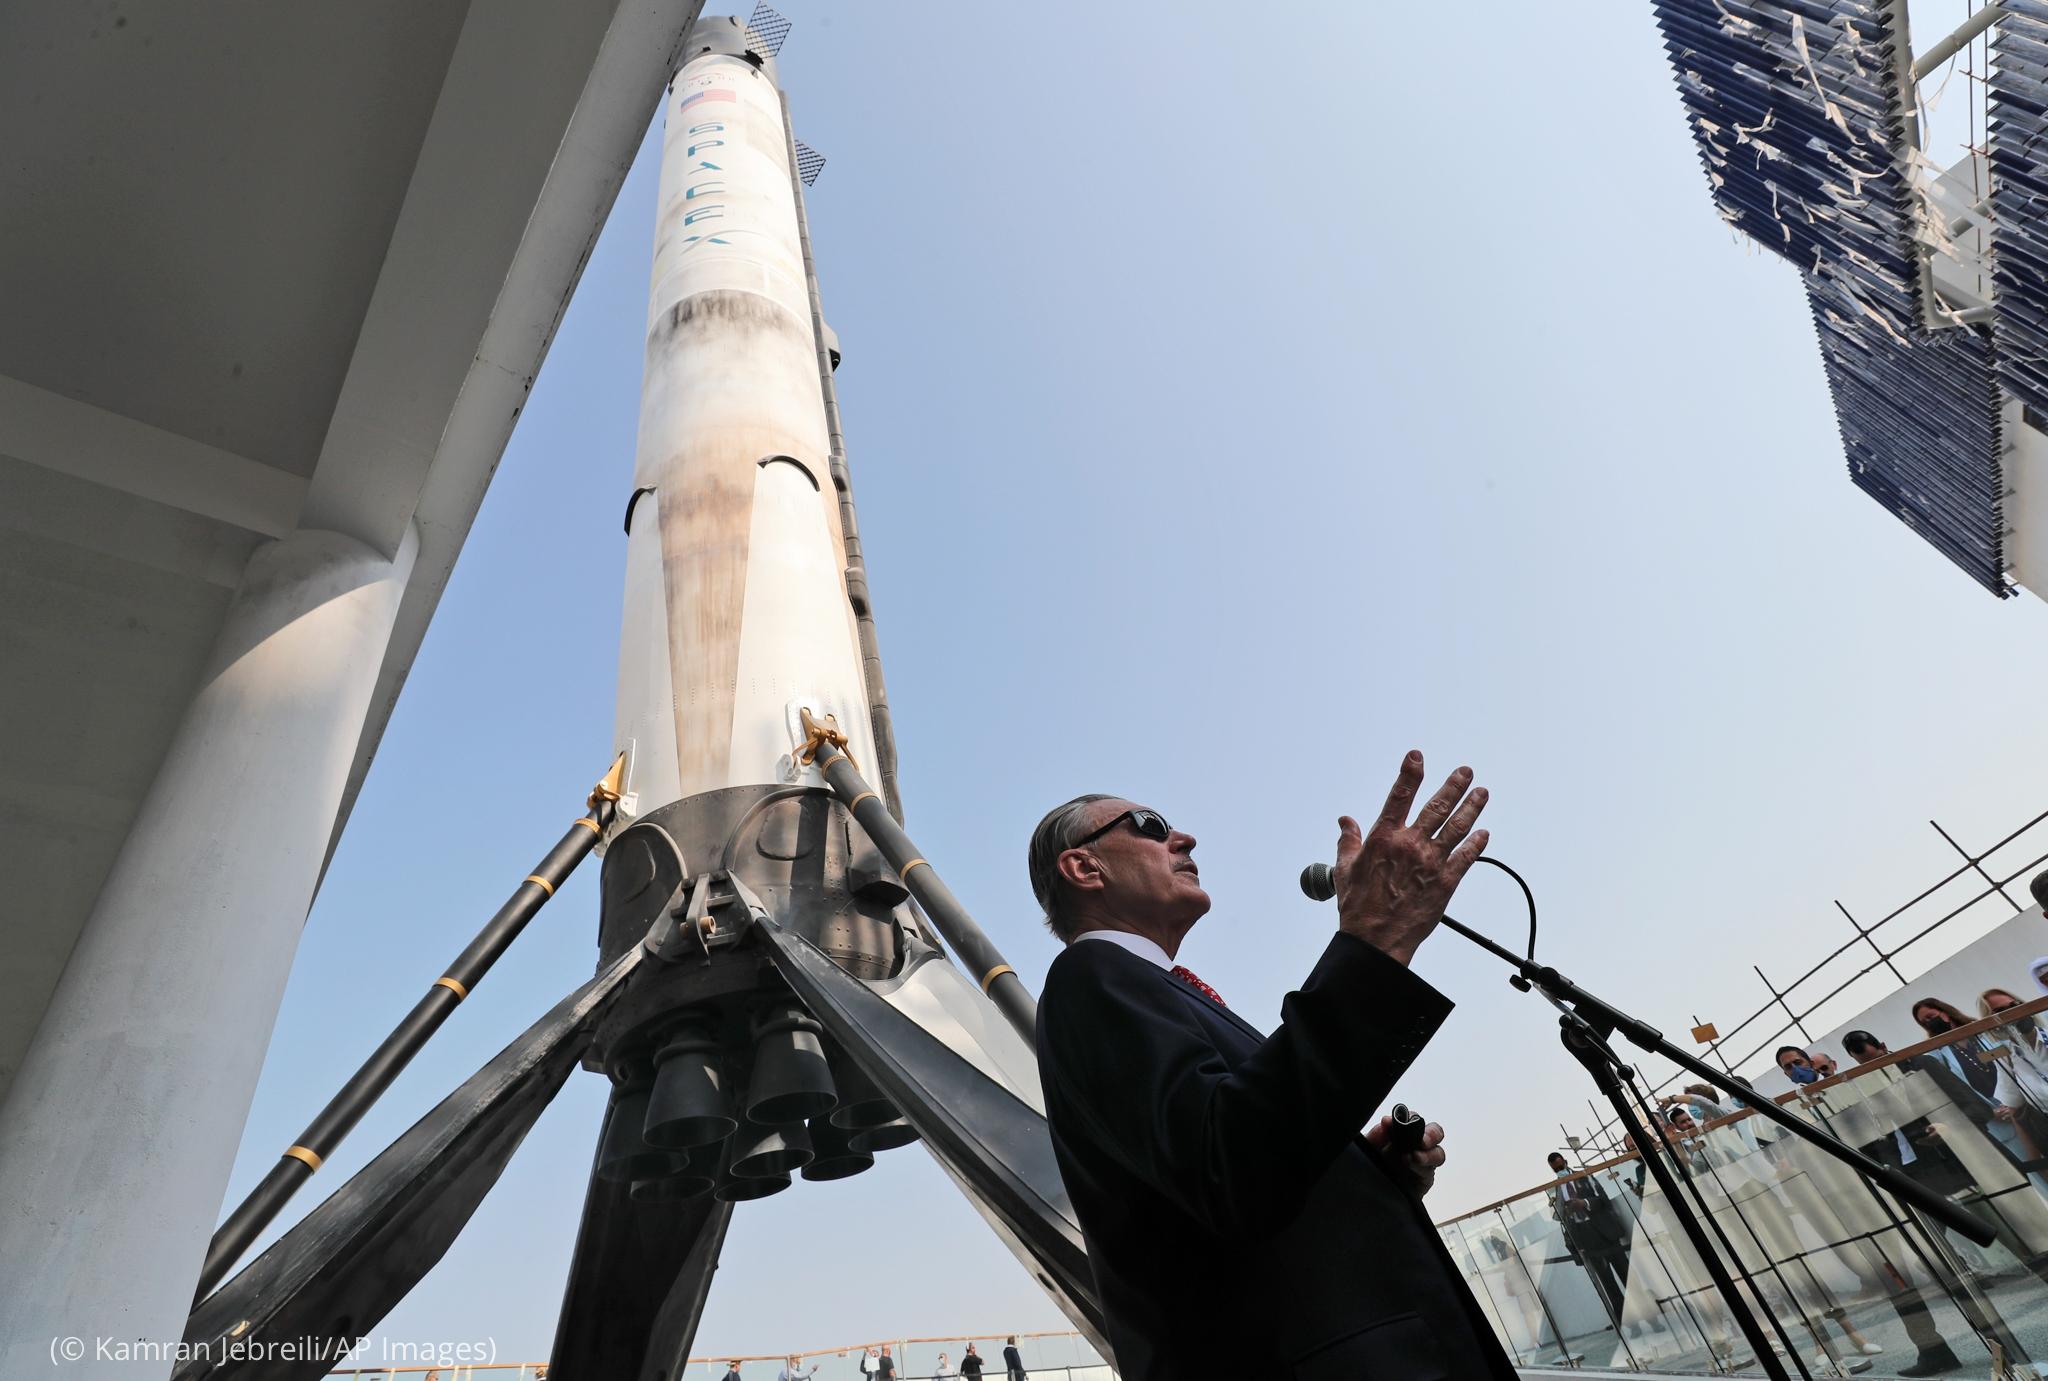 Man speaking in front of rocket replica (© Kamran Jebreili/AP Images)